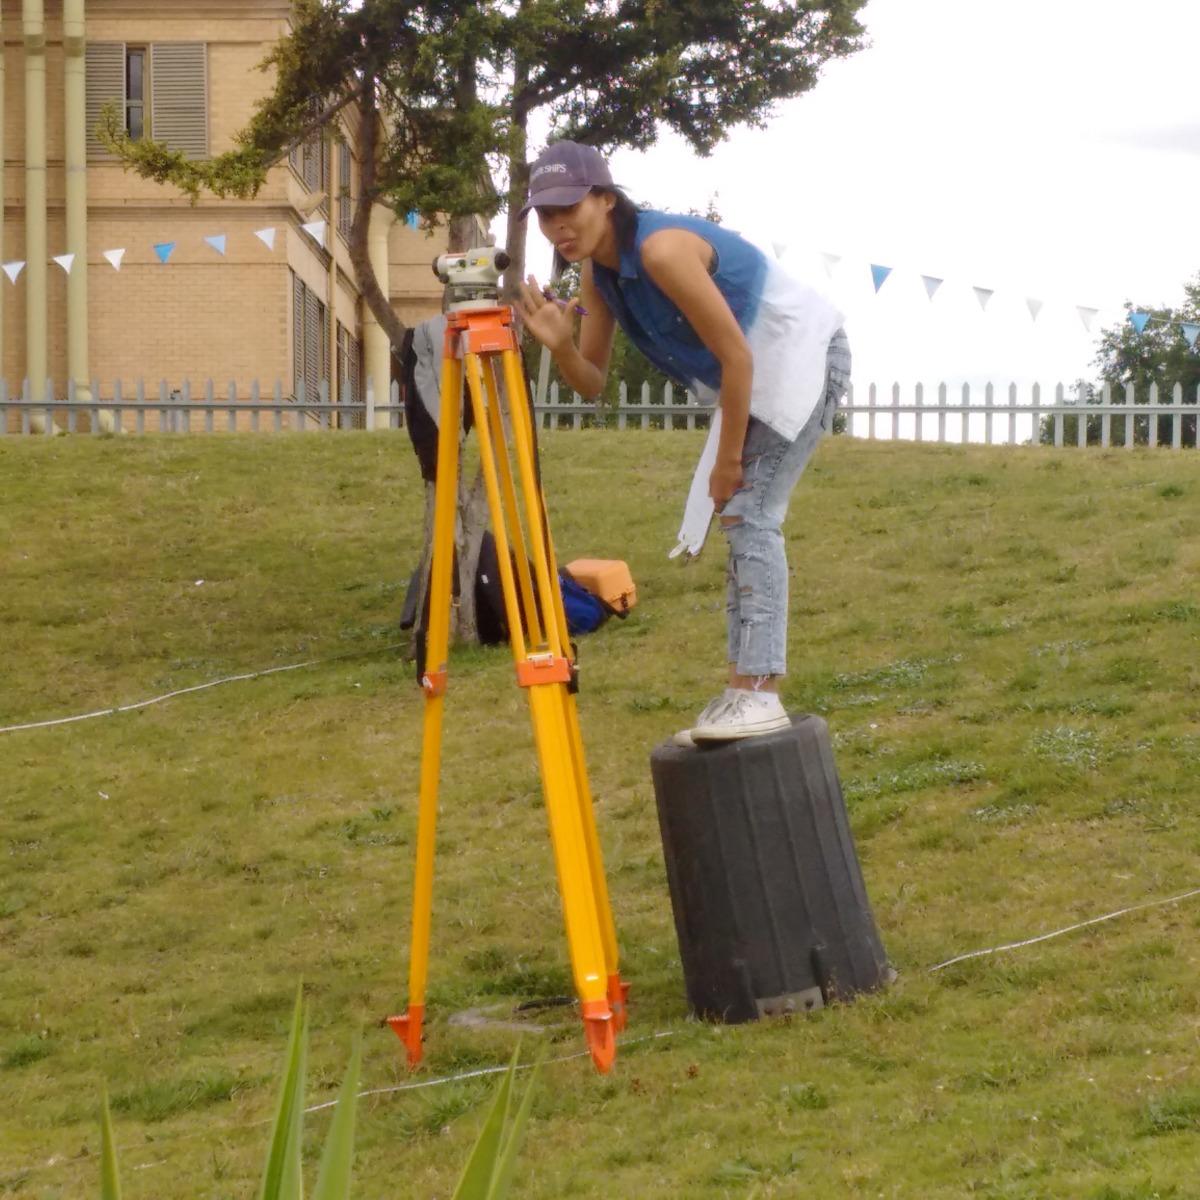 student improvising